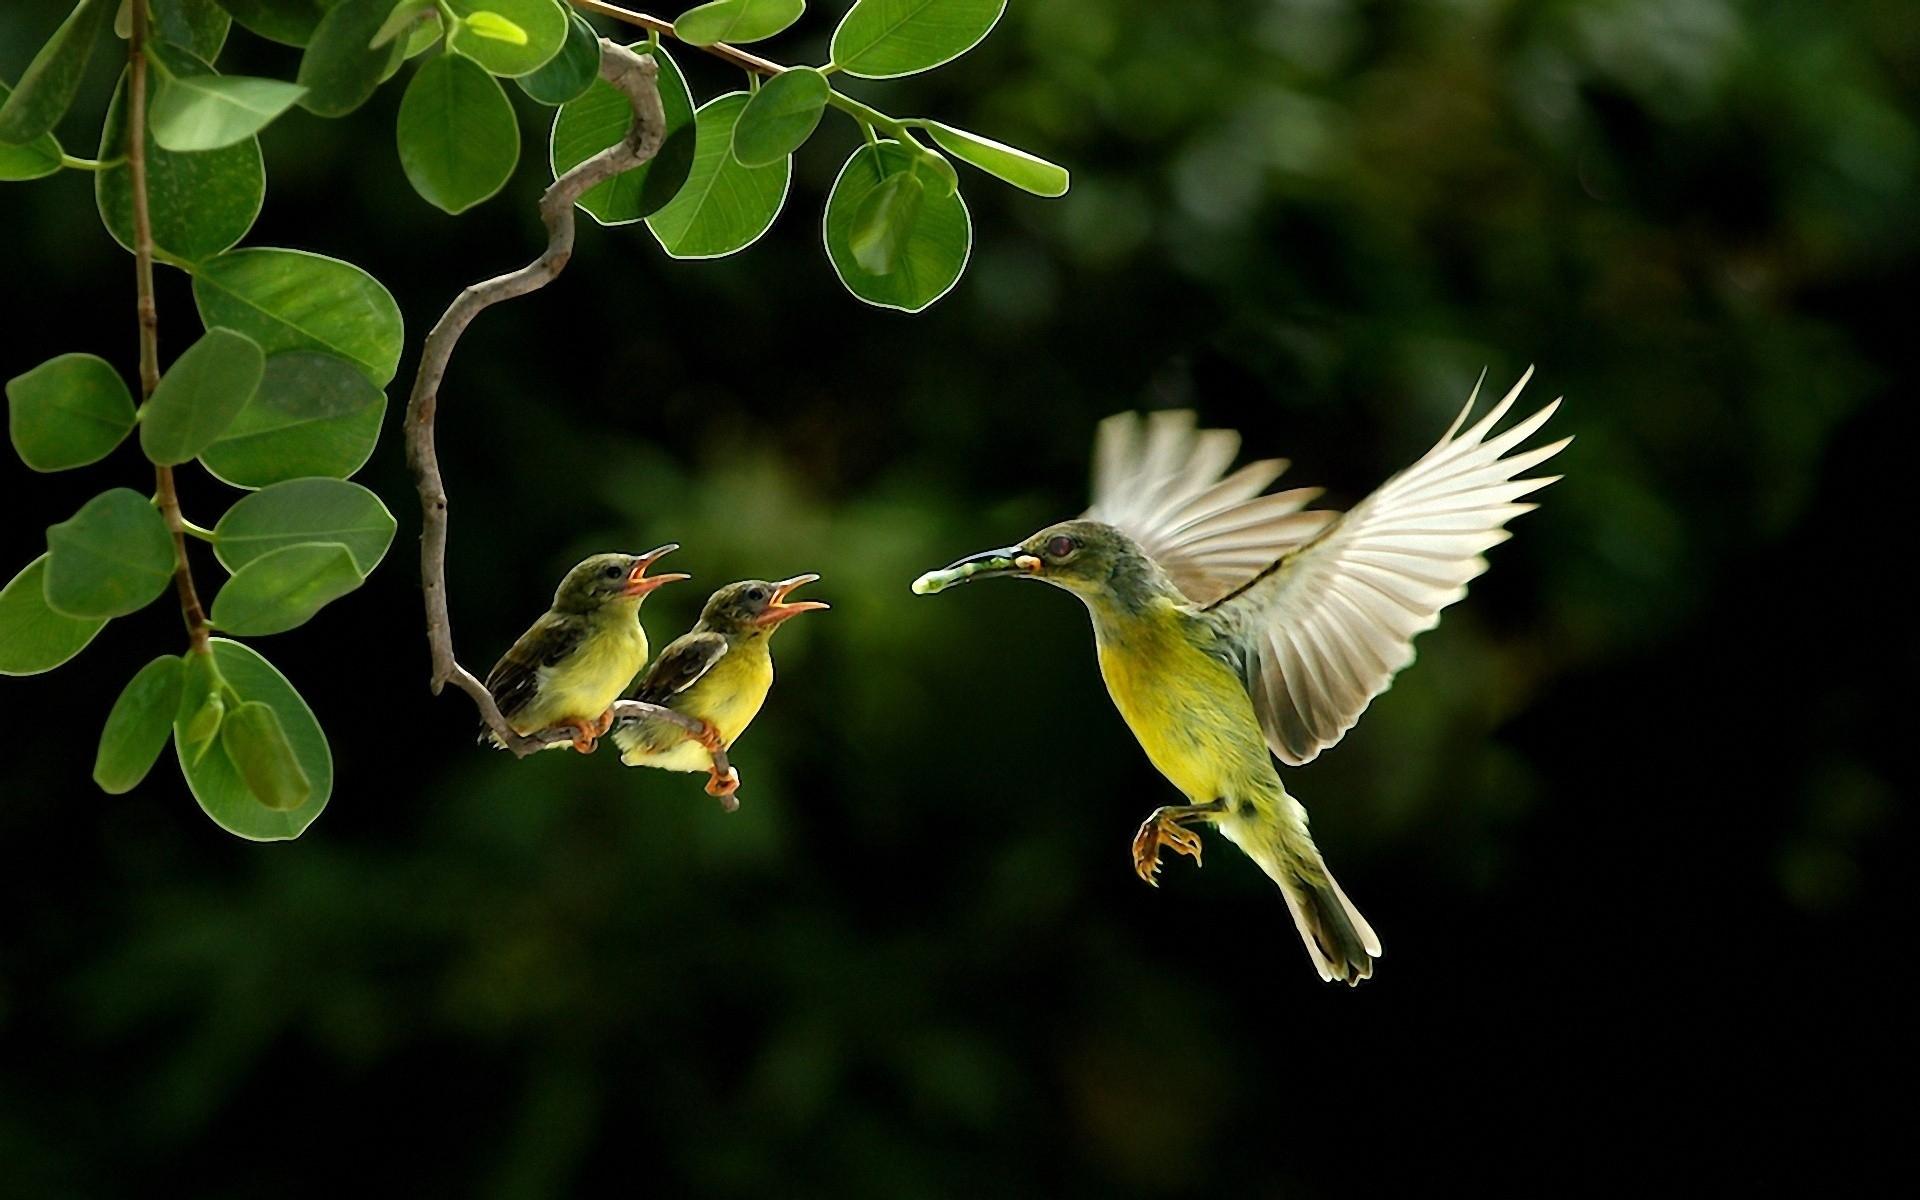 Hummingbird Wallpaper Hd Px